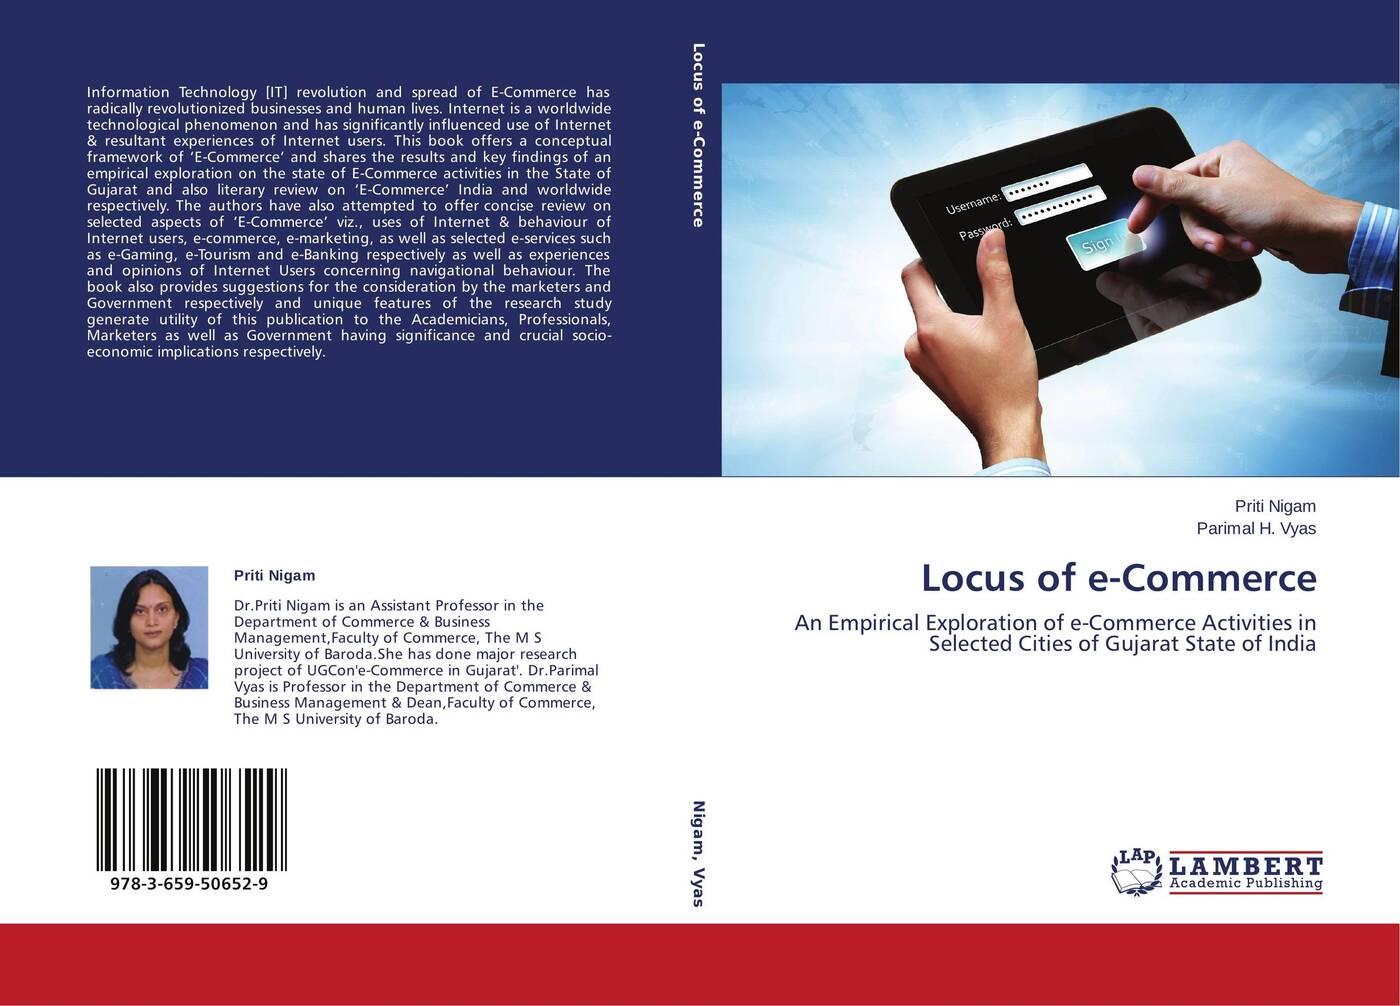 Priti Nigam and Parimal H. Vyas Locus of e-Commerce a generic architecture for e government and e democracy